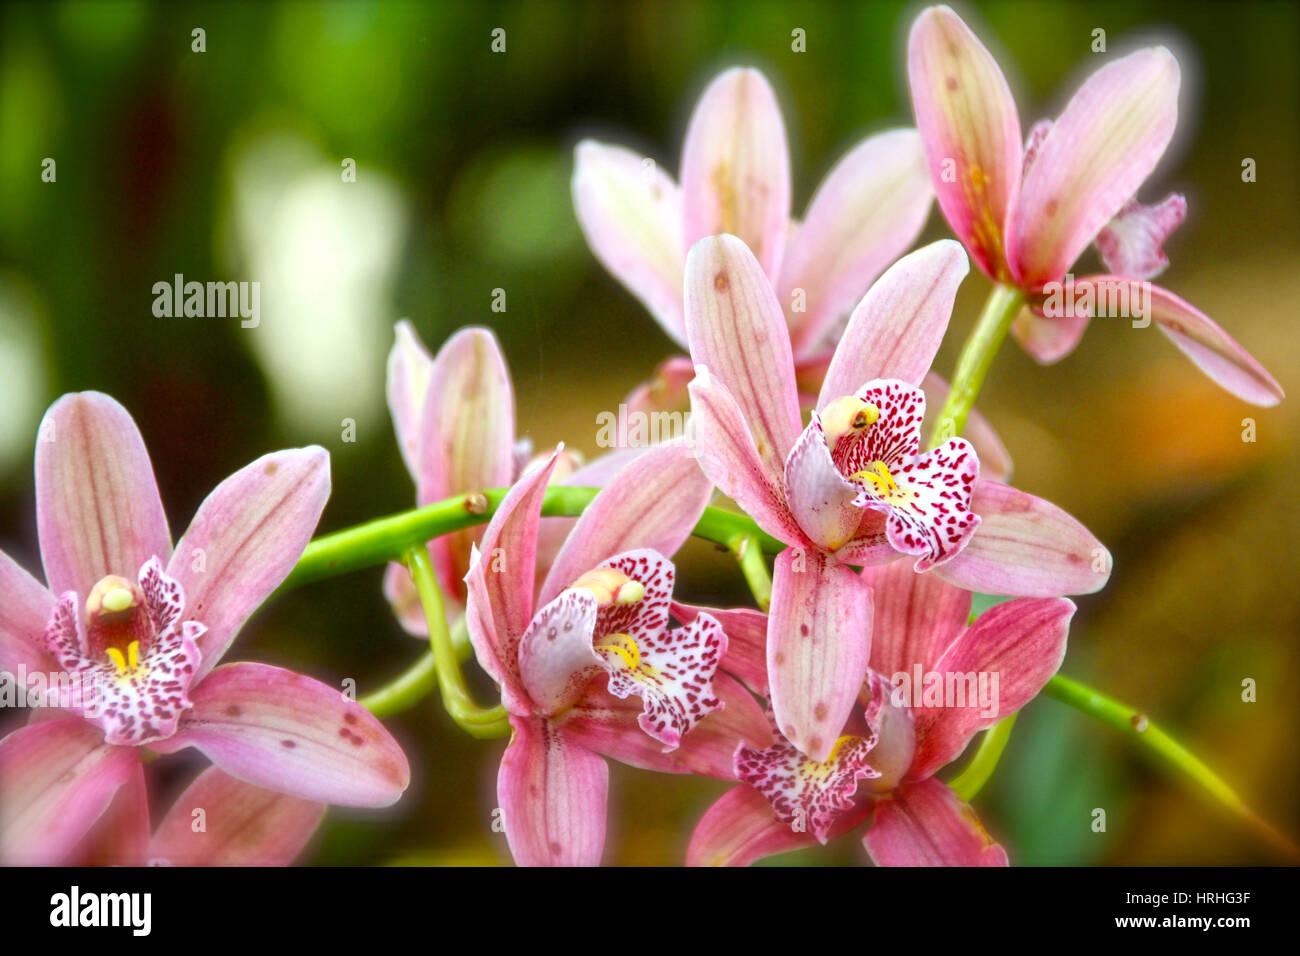 Flower Screensaver Stock Photos Flower Screensaver Stock Images